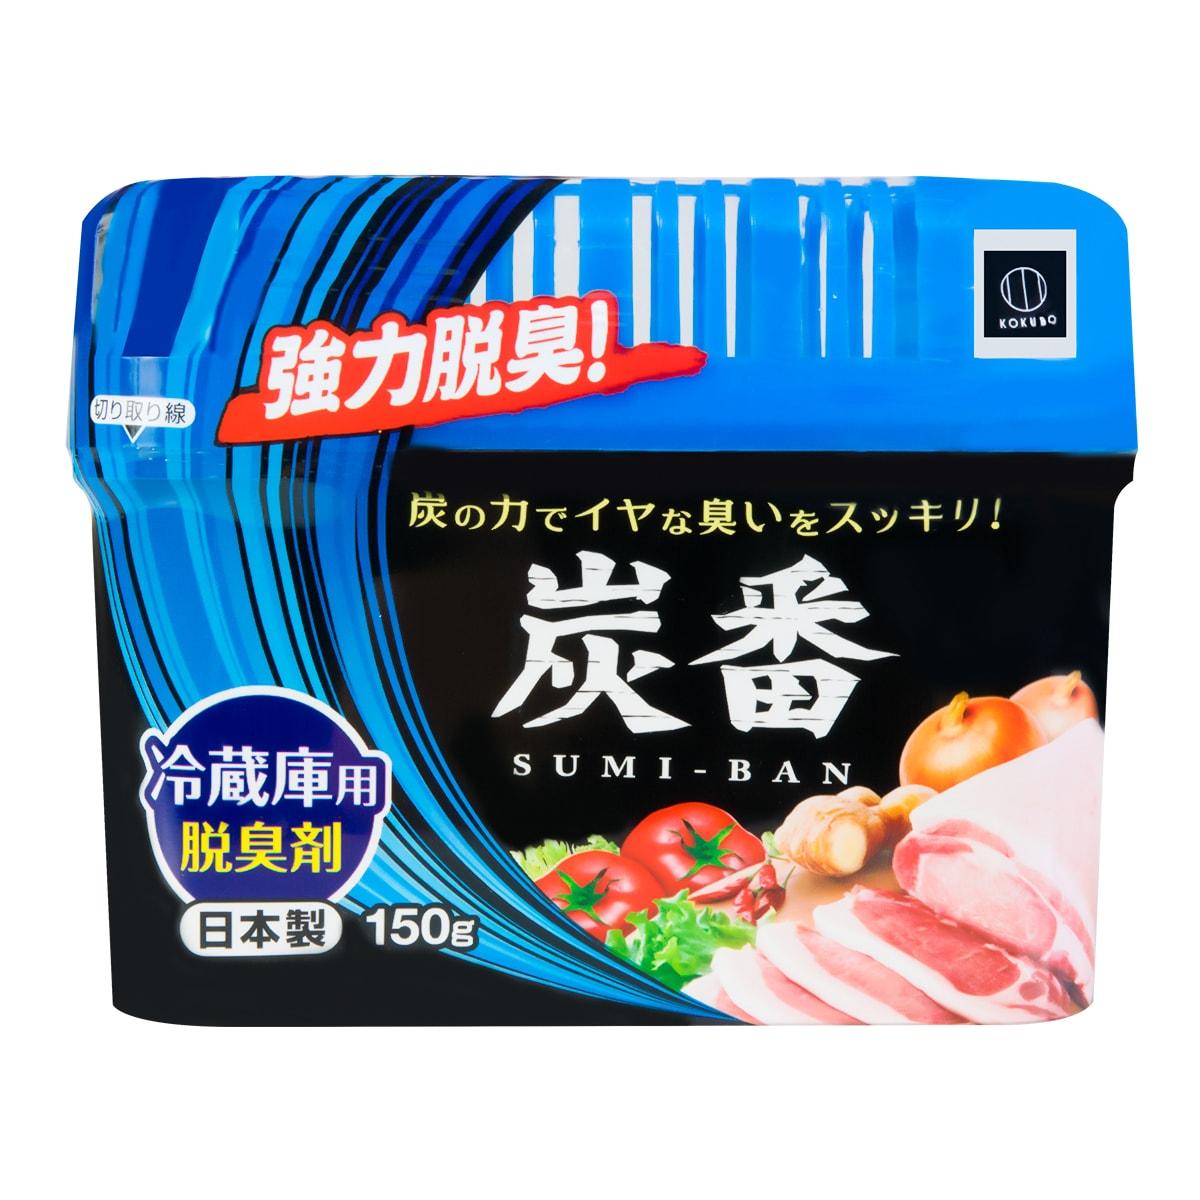 Yamibuy.com:Customer reviews:KOKUBO Charcoal Refrigerator Deodorizer 150g